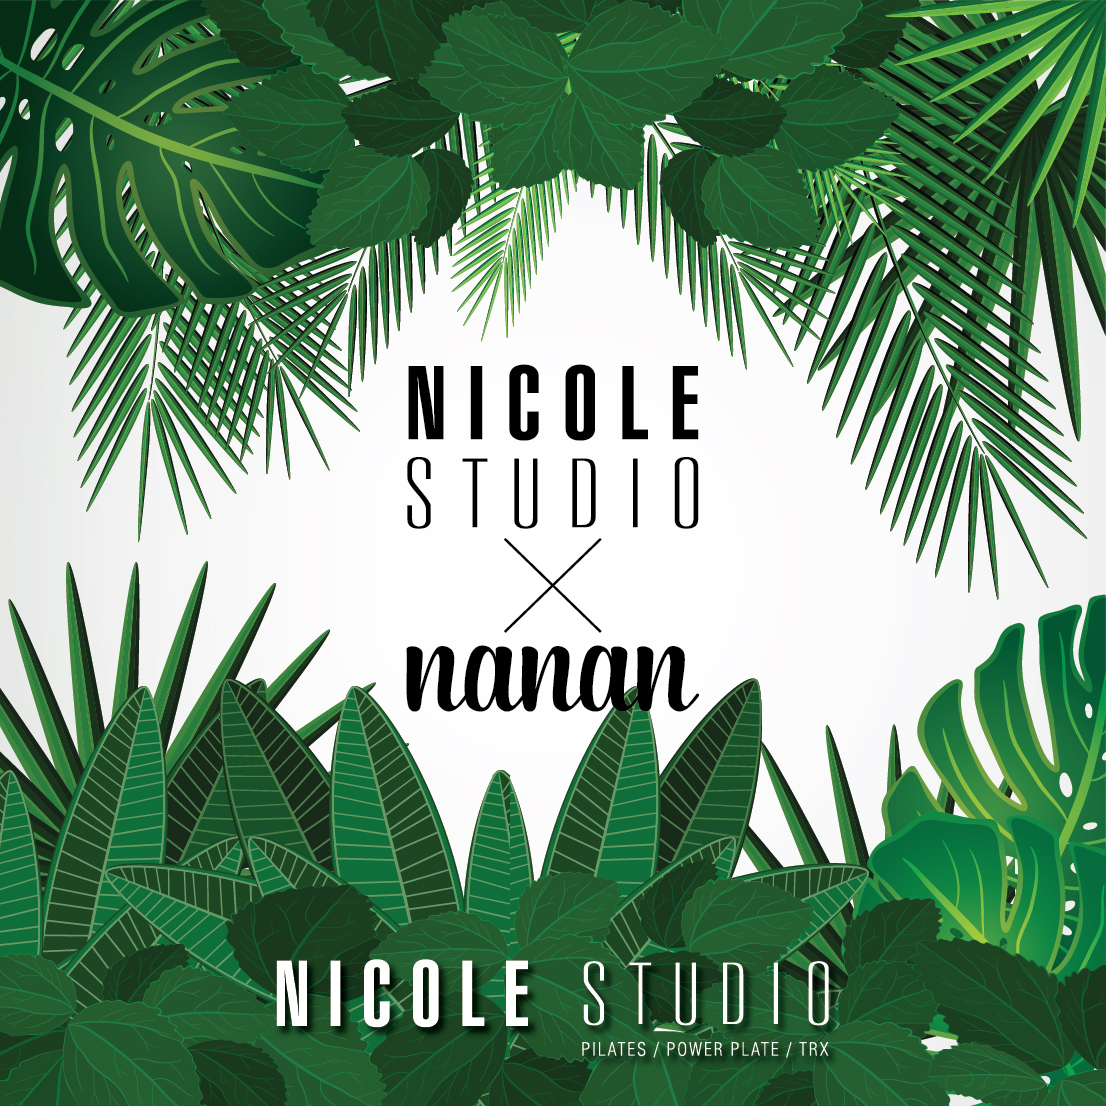 NICOLE STUDIO